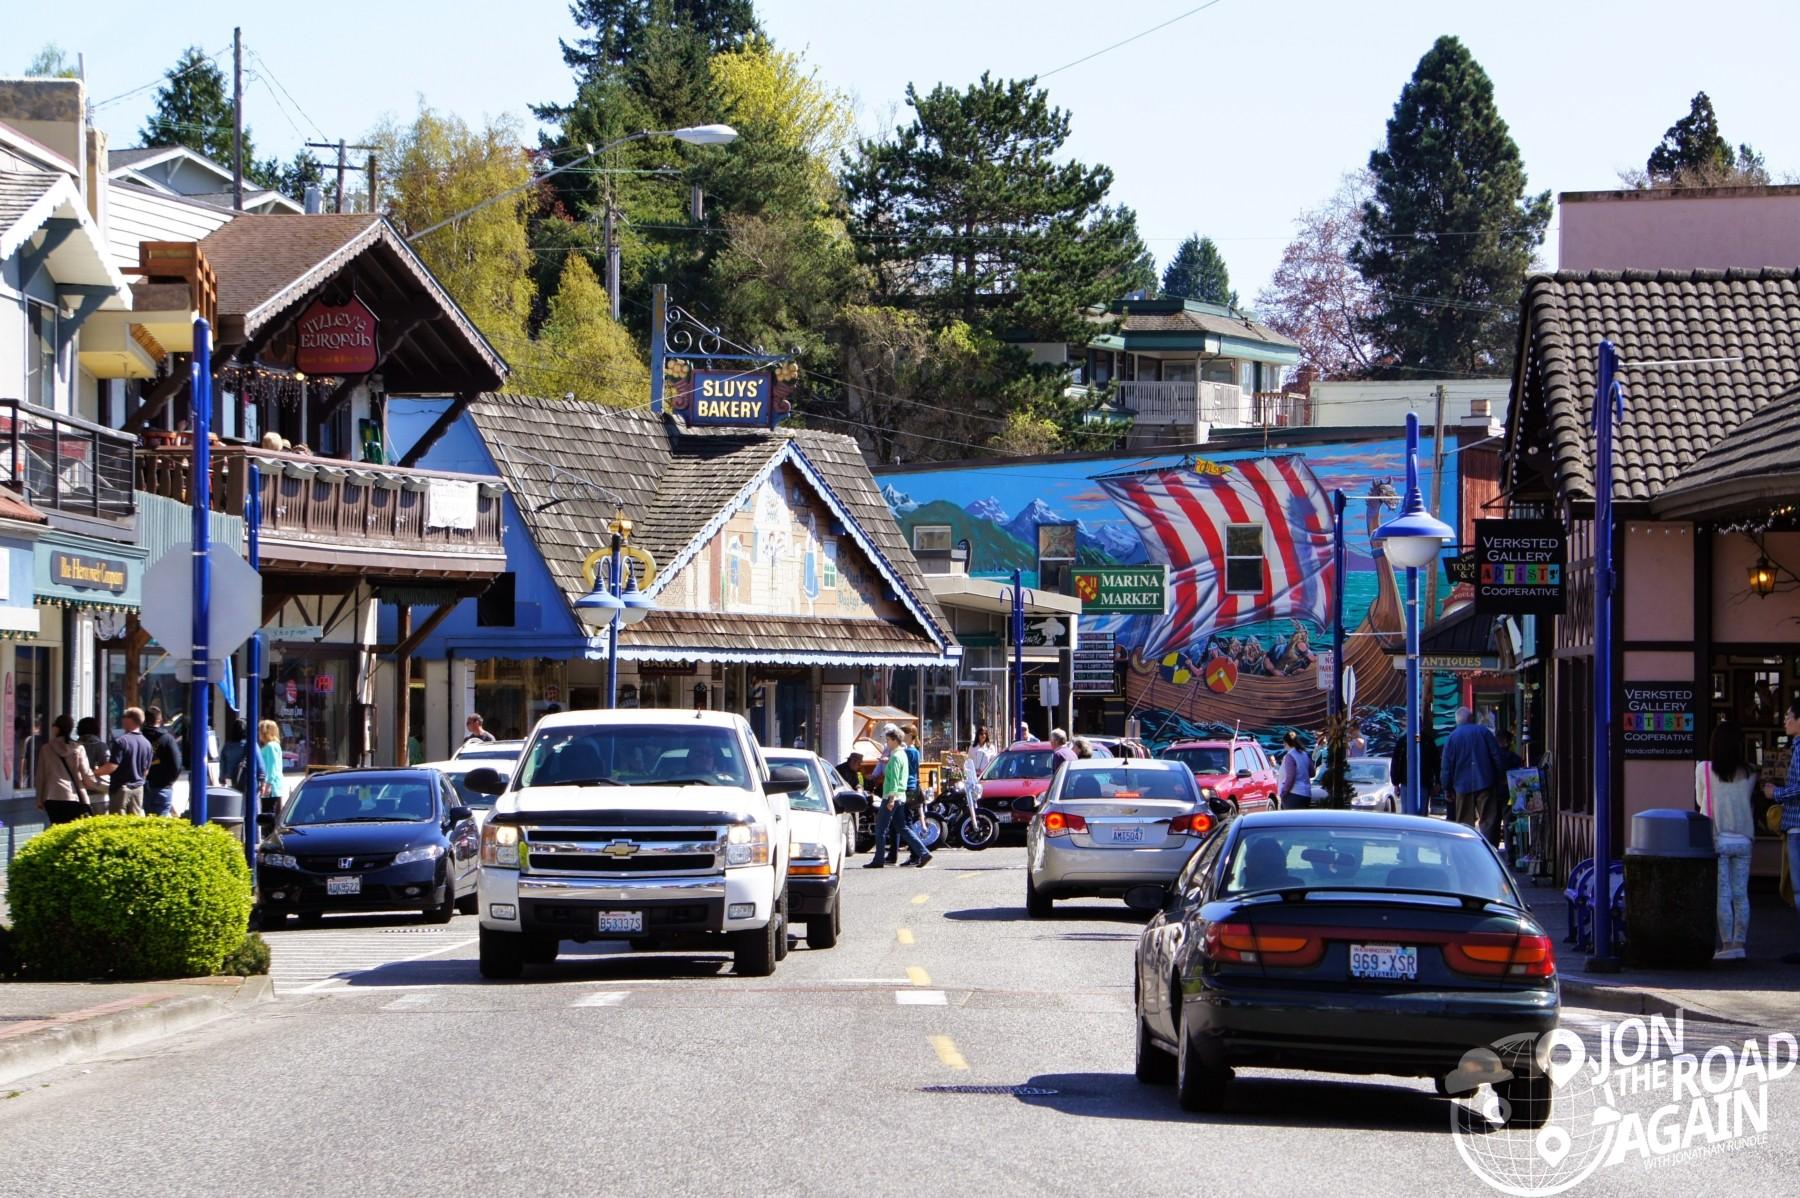 Main street of Poulsbo